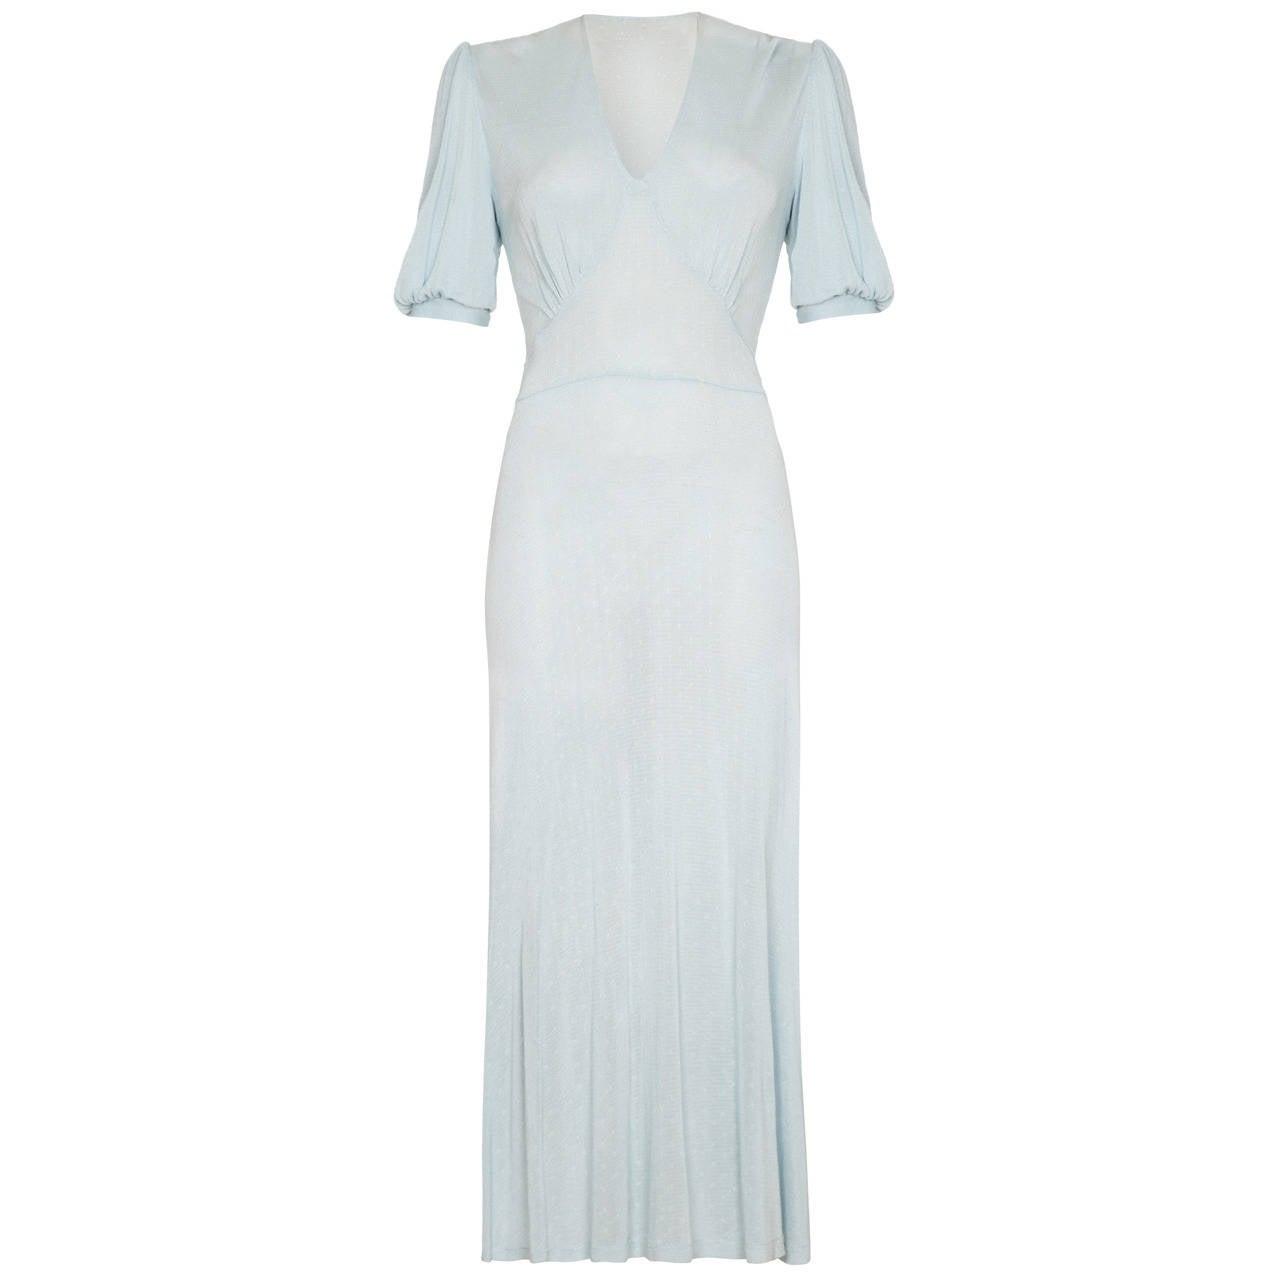 1930s Pale Blue Knit Dress